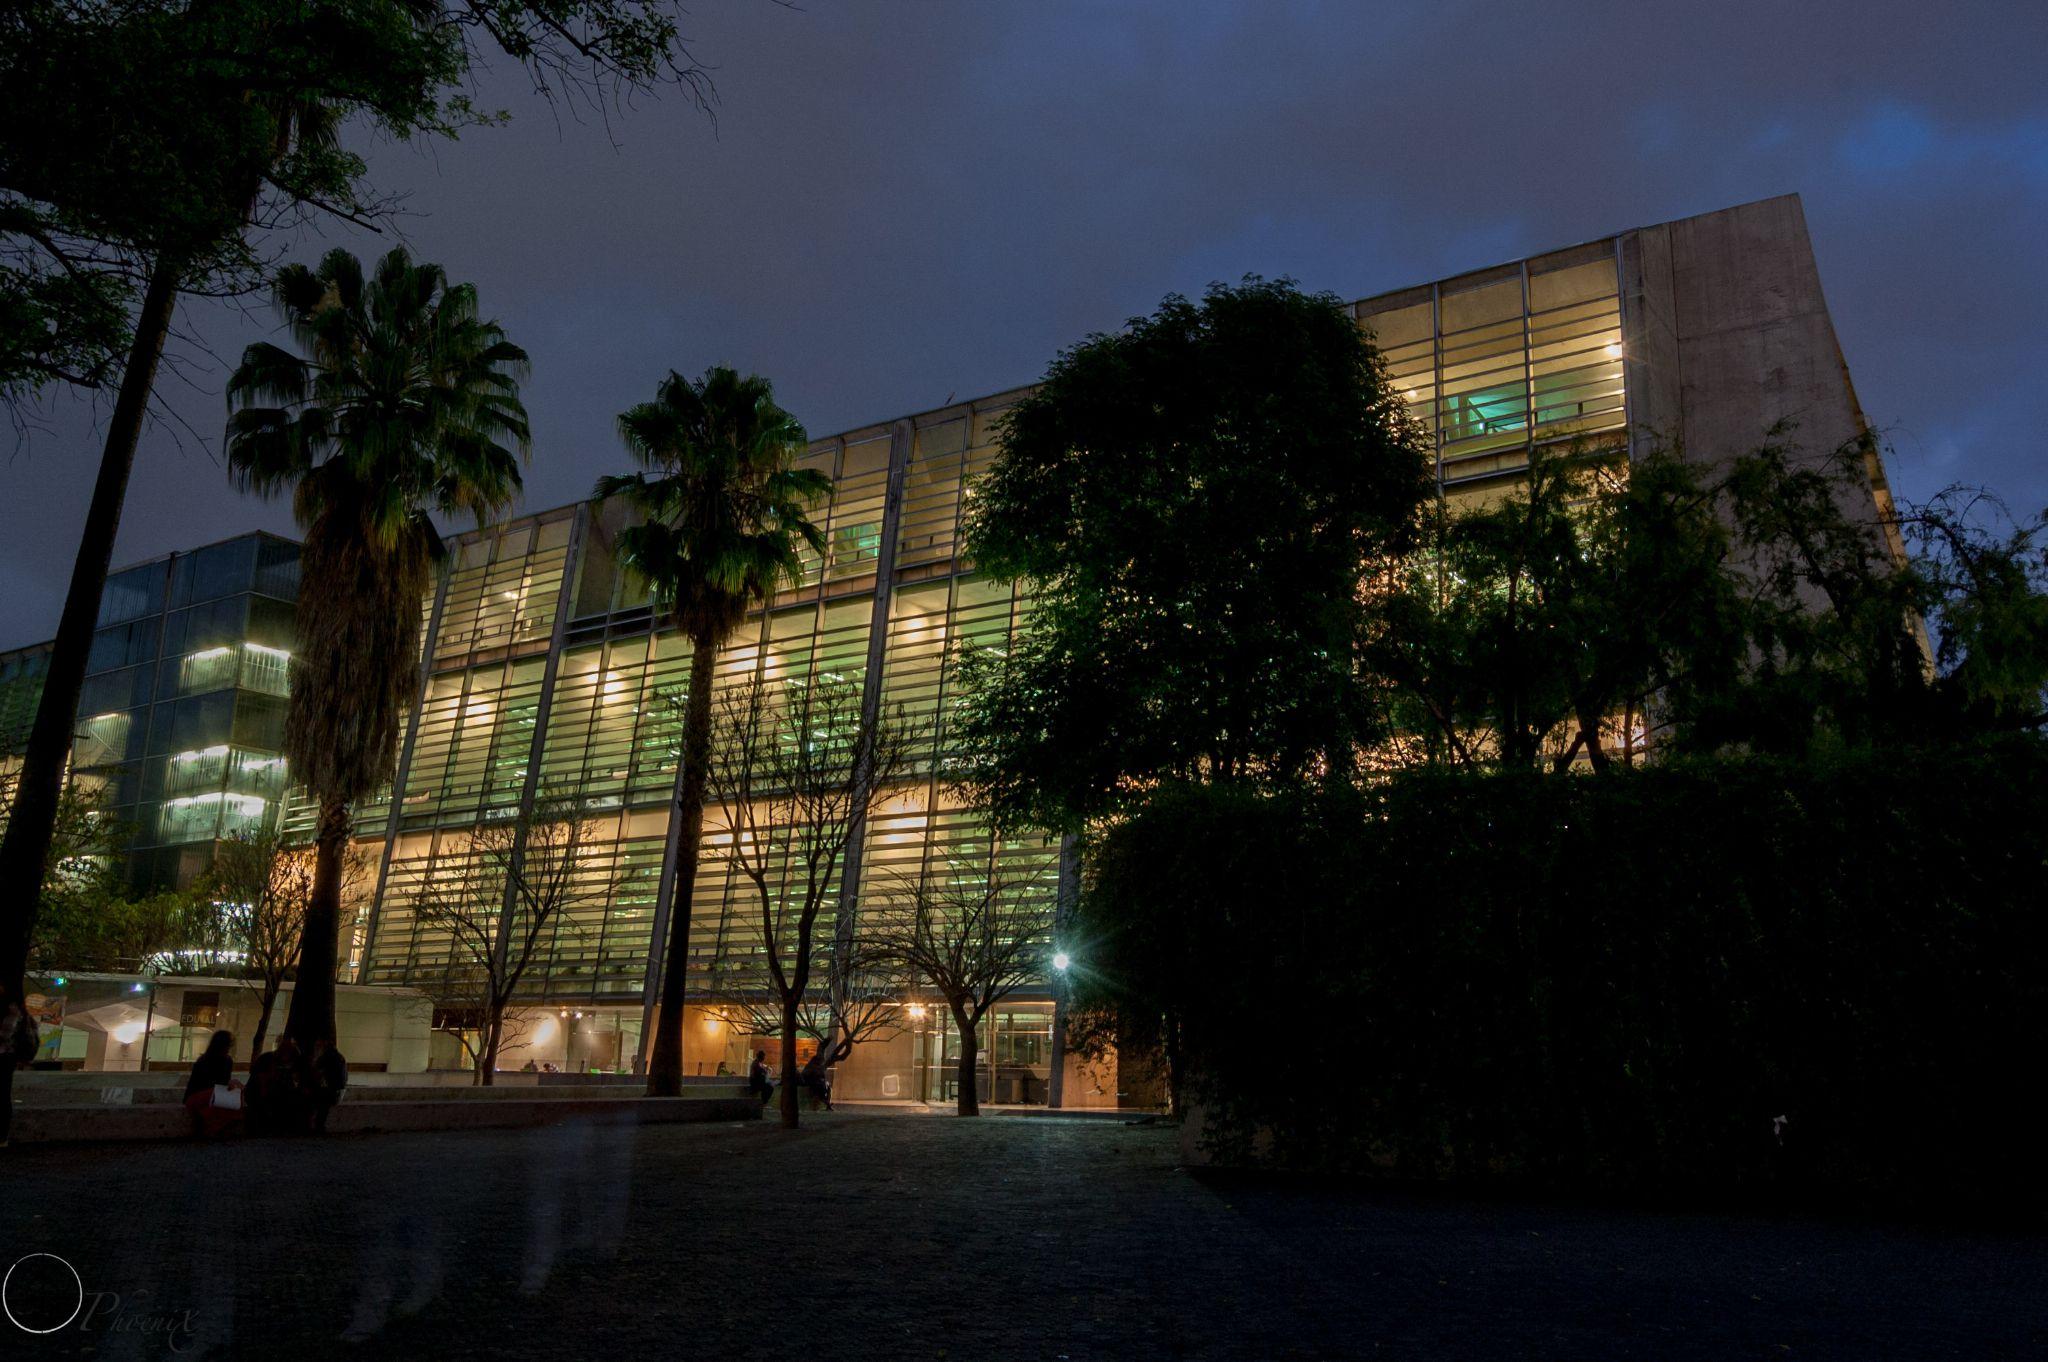 Jose Vasconcelos Public Library by Phoenix